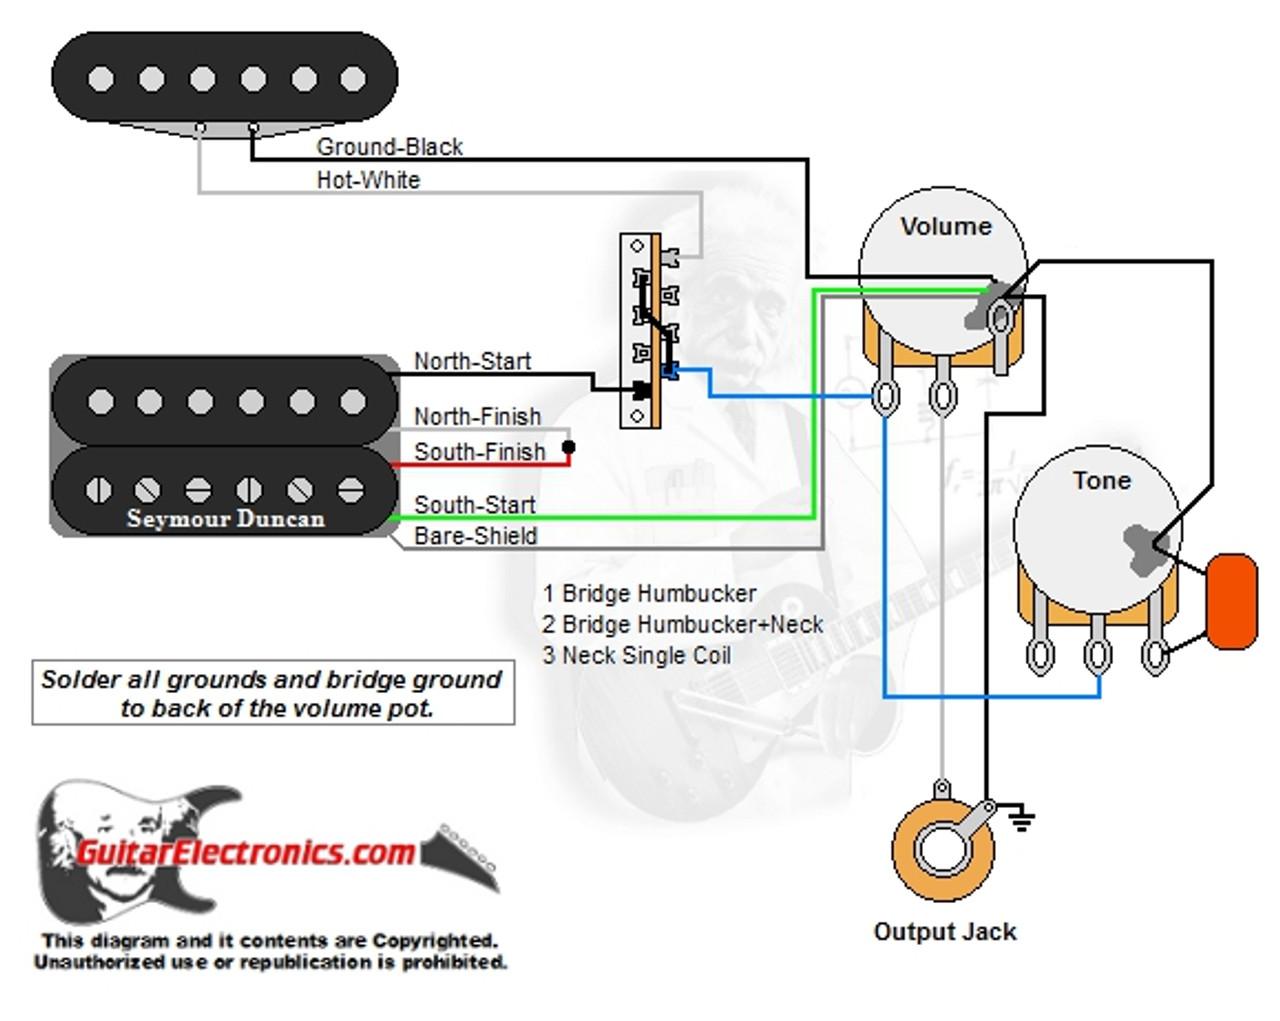 small resolution of  diagramshumbucker wiring diagrams 1 humbucker 1 single coil 3 way lever switch 1 volume 1 tone 001 humbucker 1